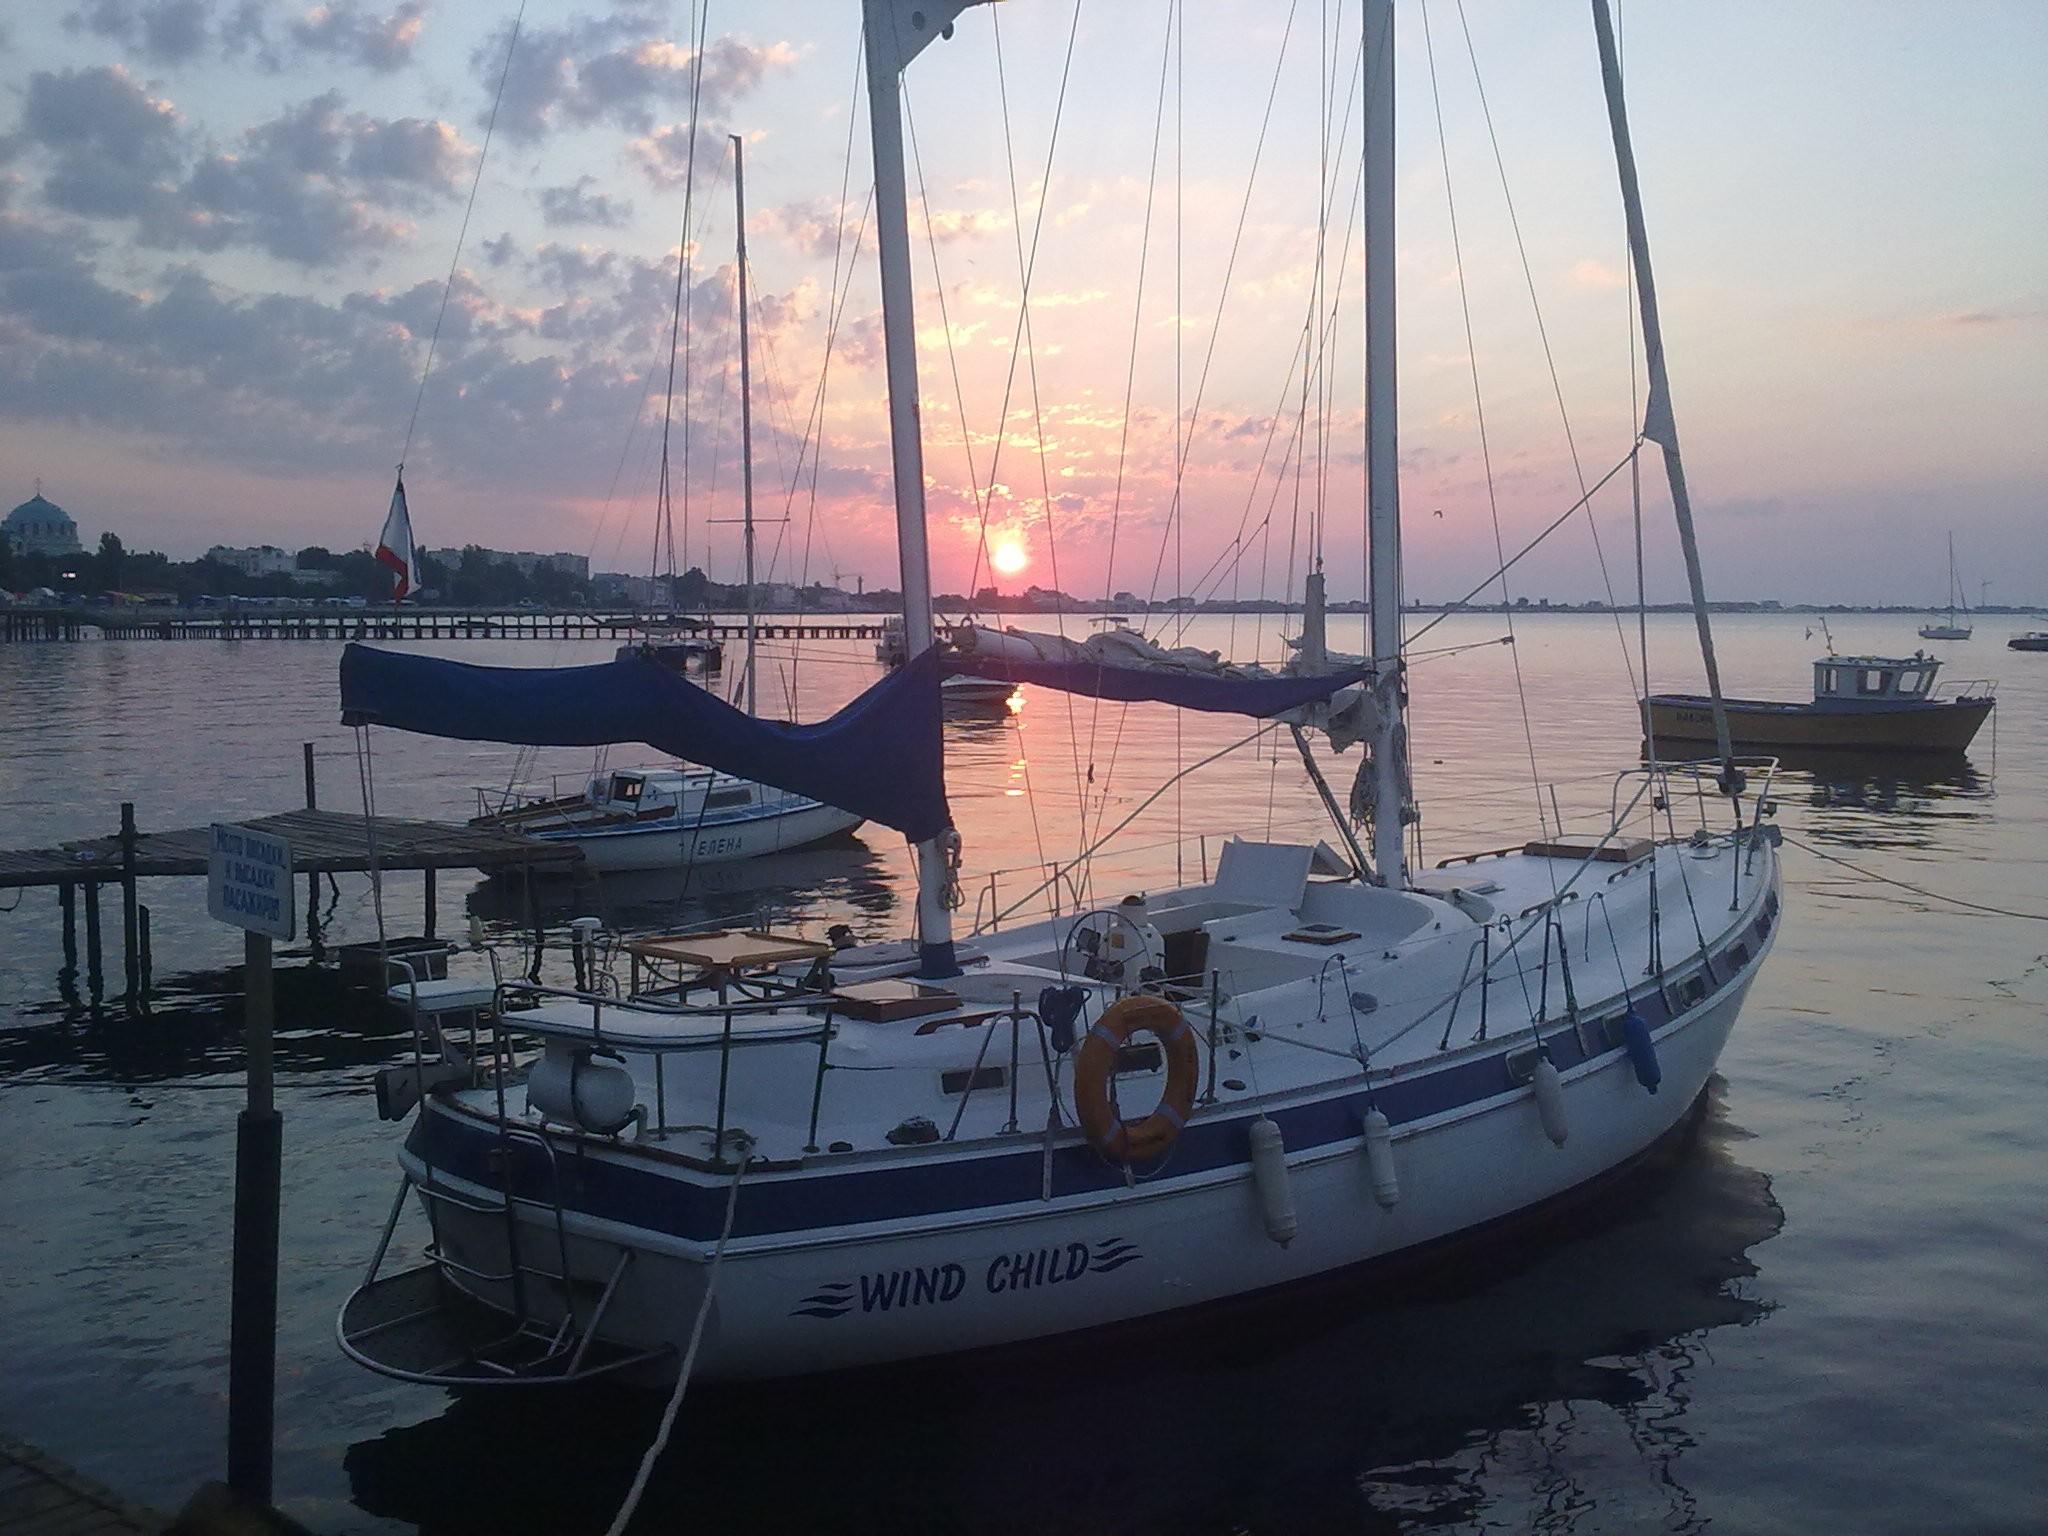 Фото: Аренда парусно-моторной яхты